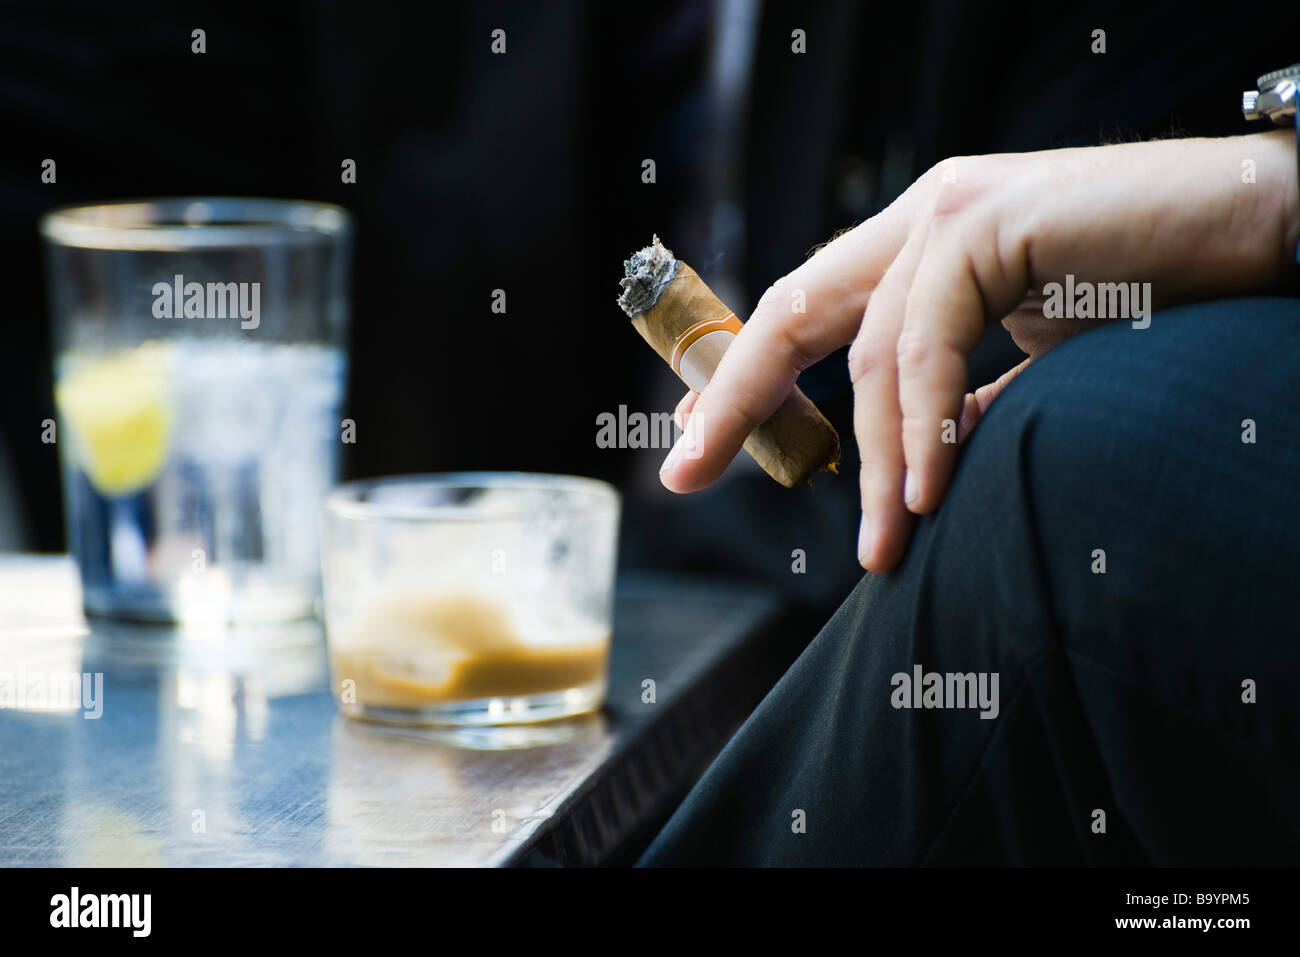 Man's hand on knee holding smoking cigar, close-up Stock Photo